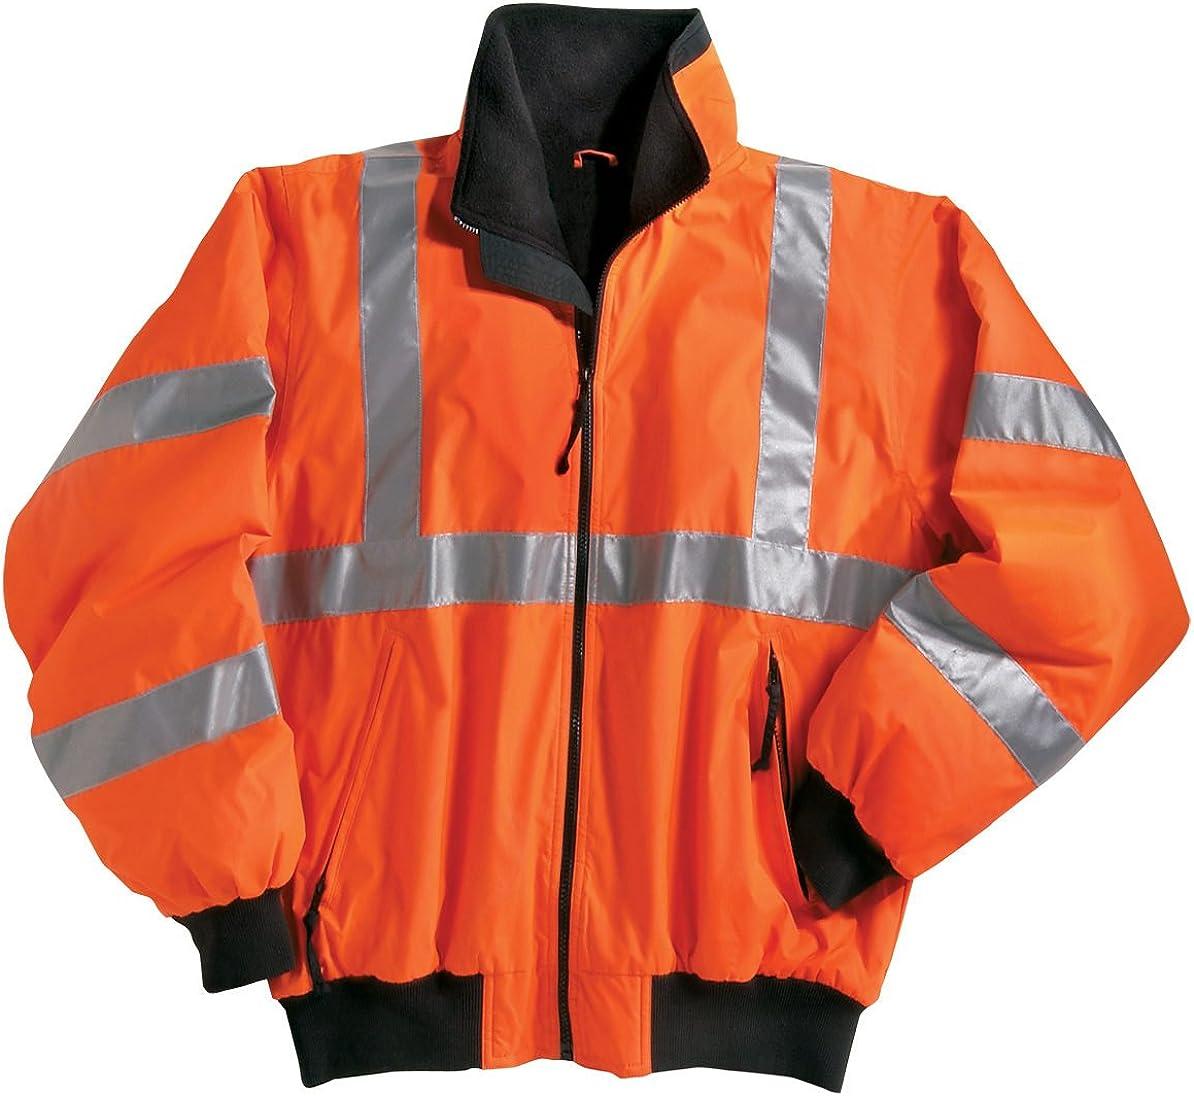 Tri-Mountain Men's 8830 District Safety Jacket